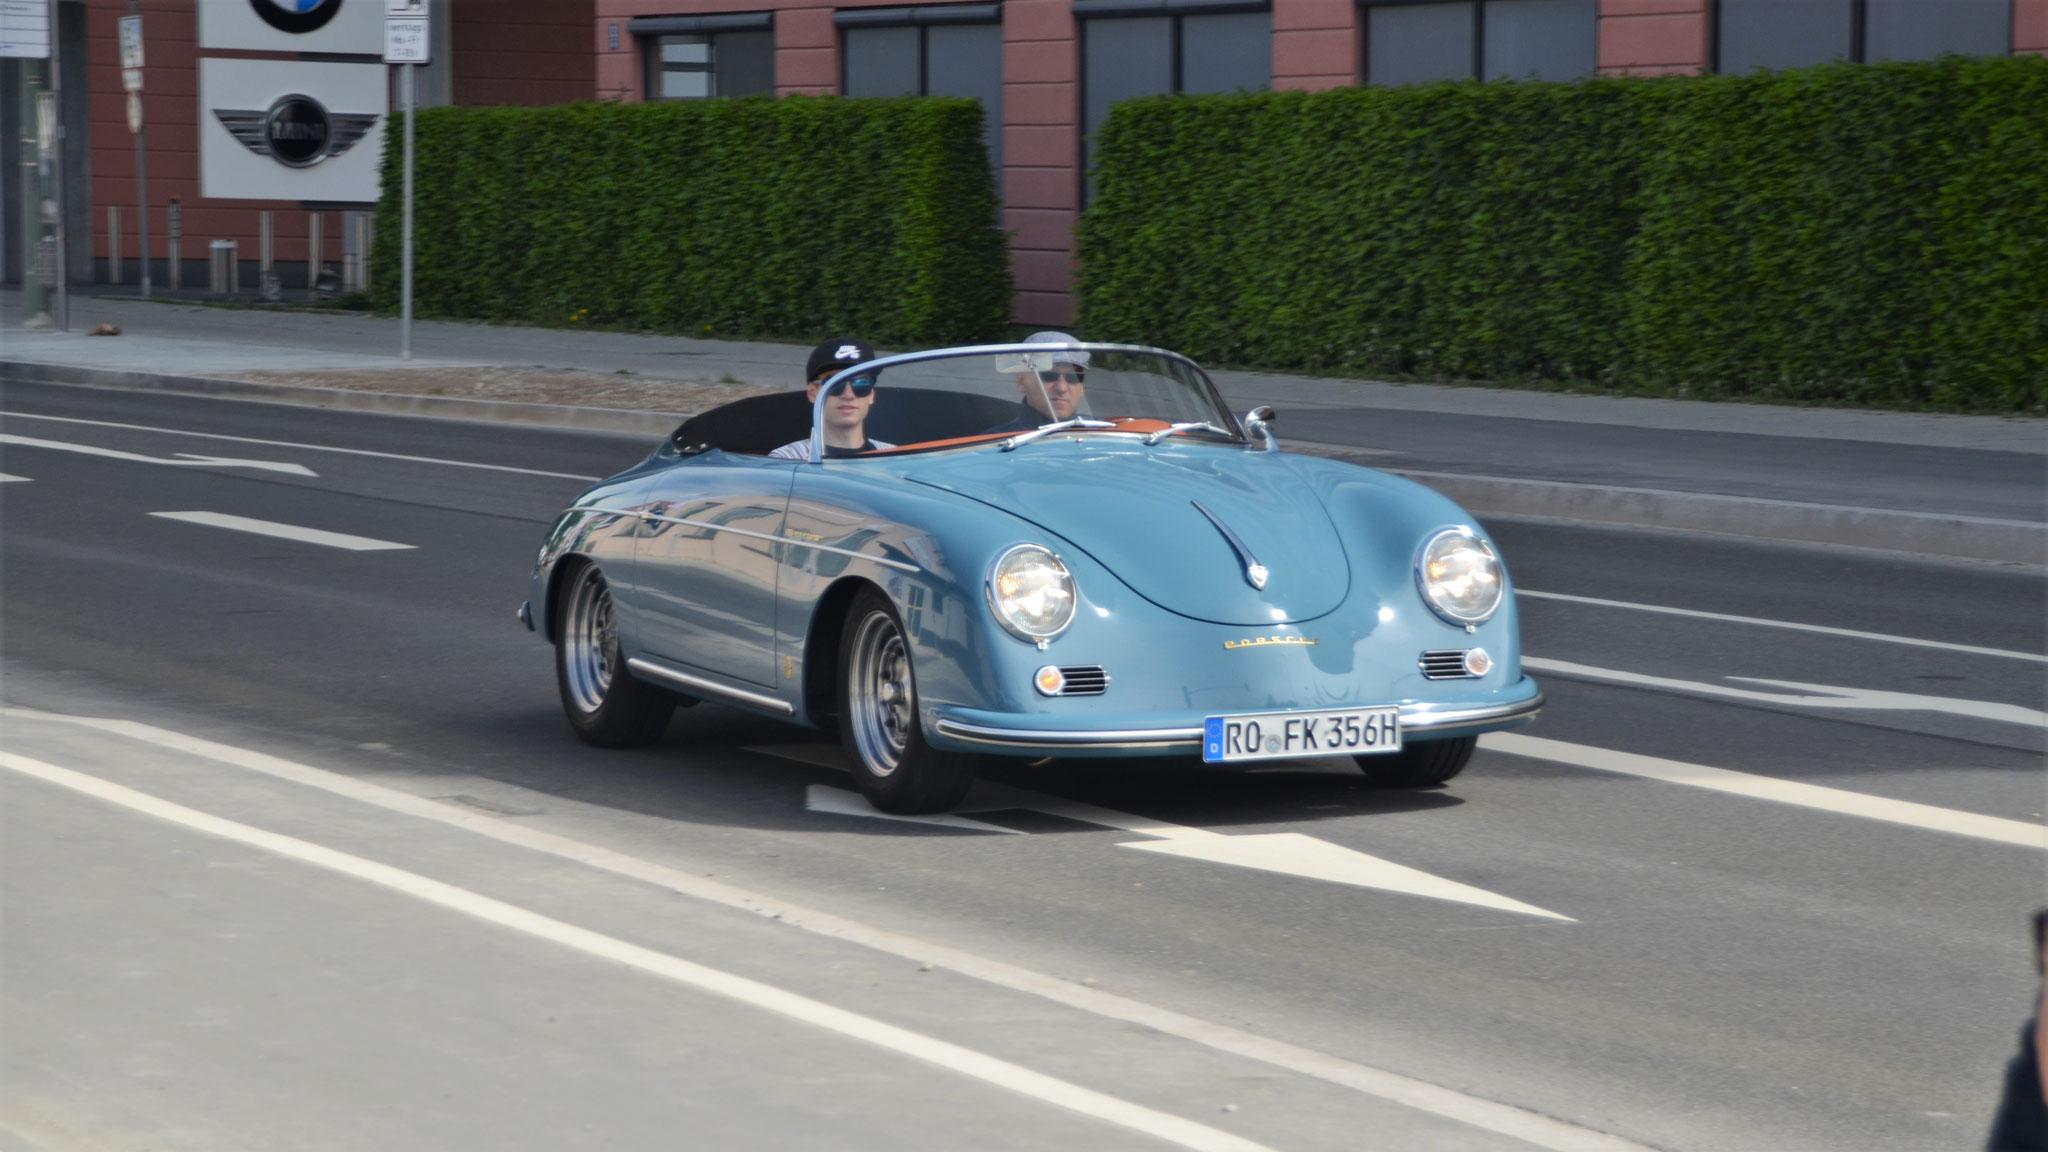 Porsche 356 1600 Super Speedster - RO-FK-356H